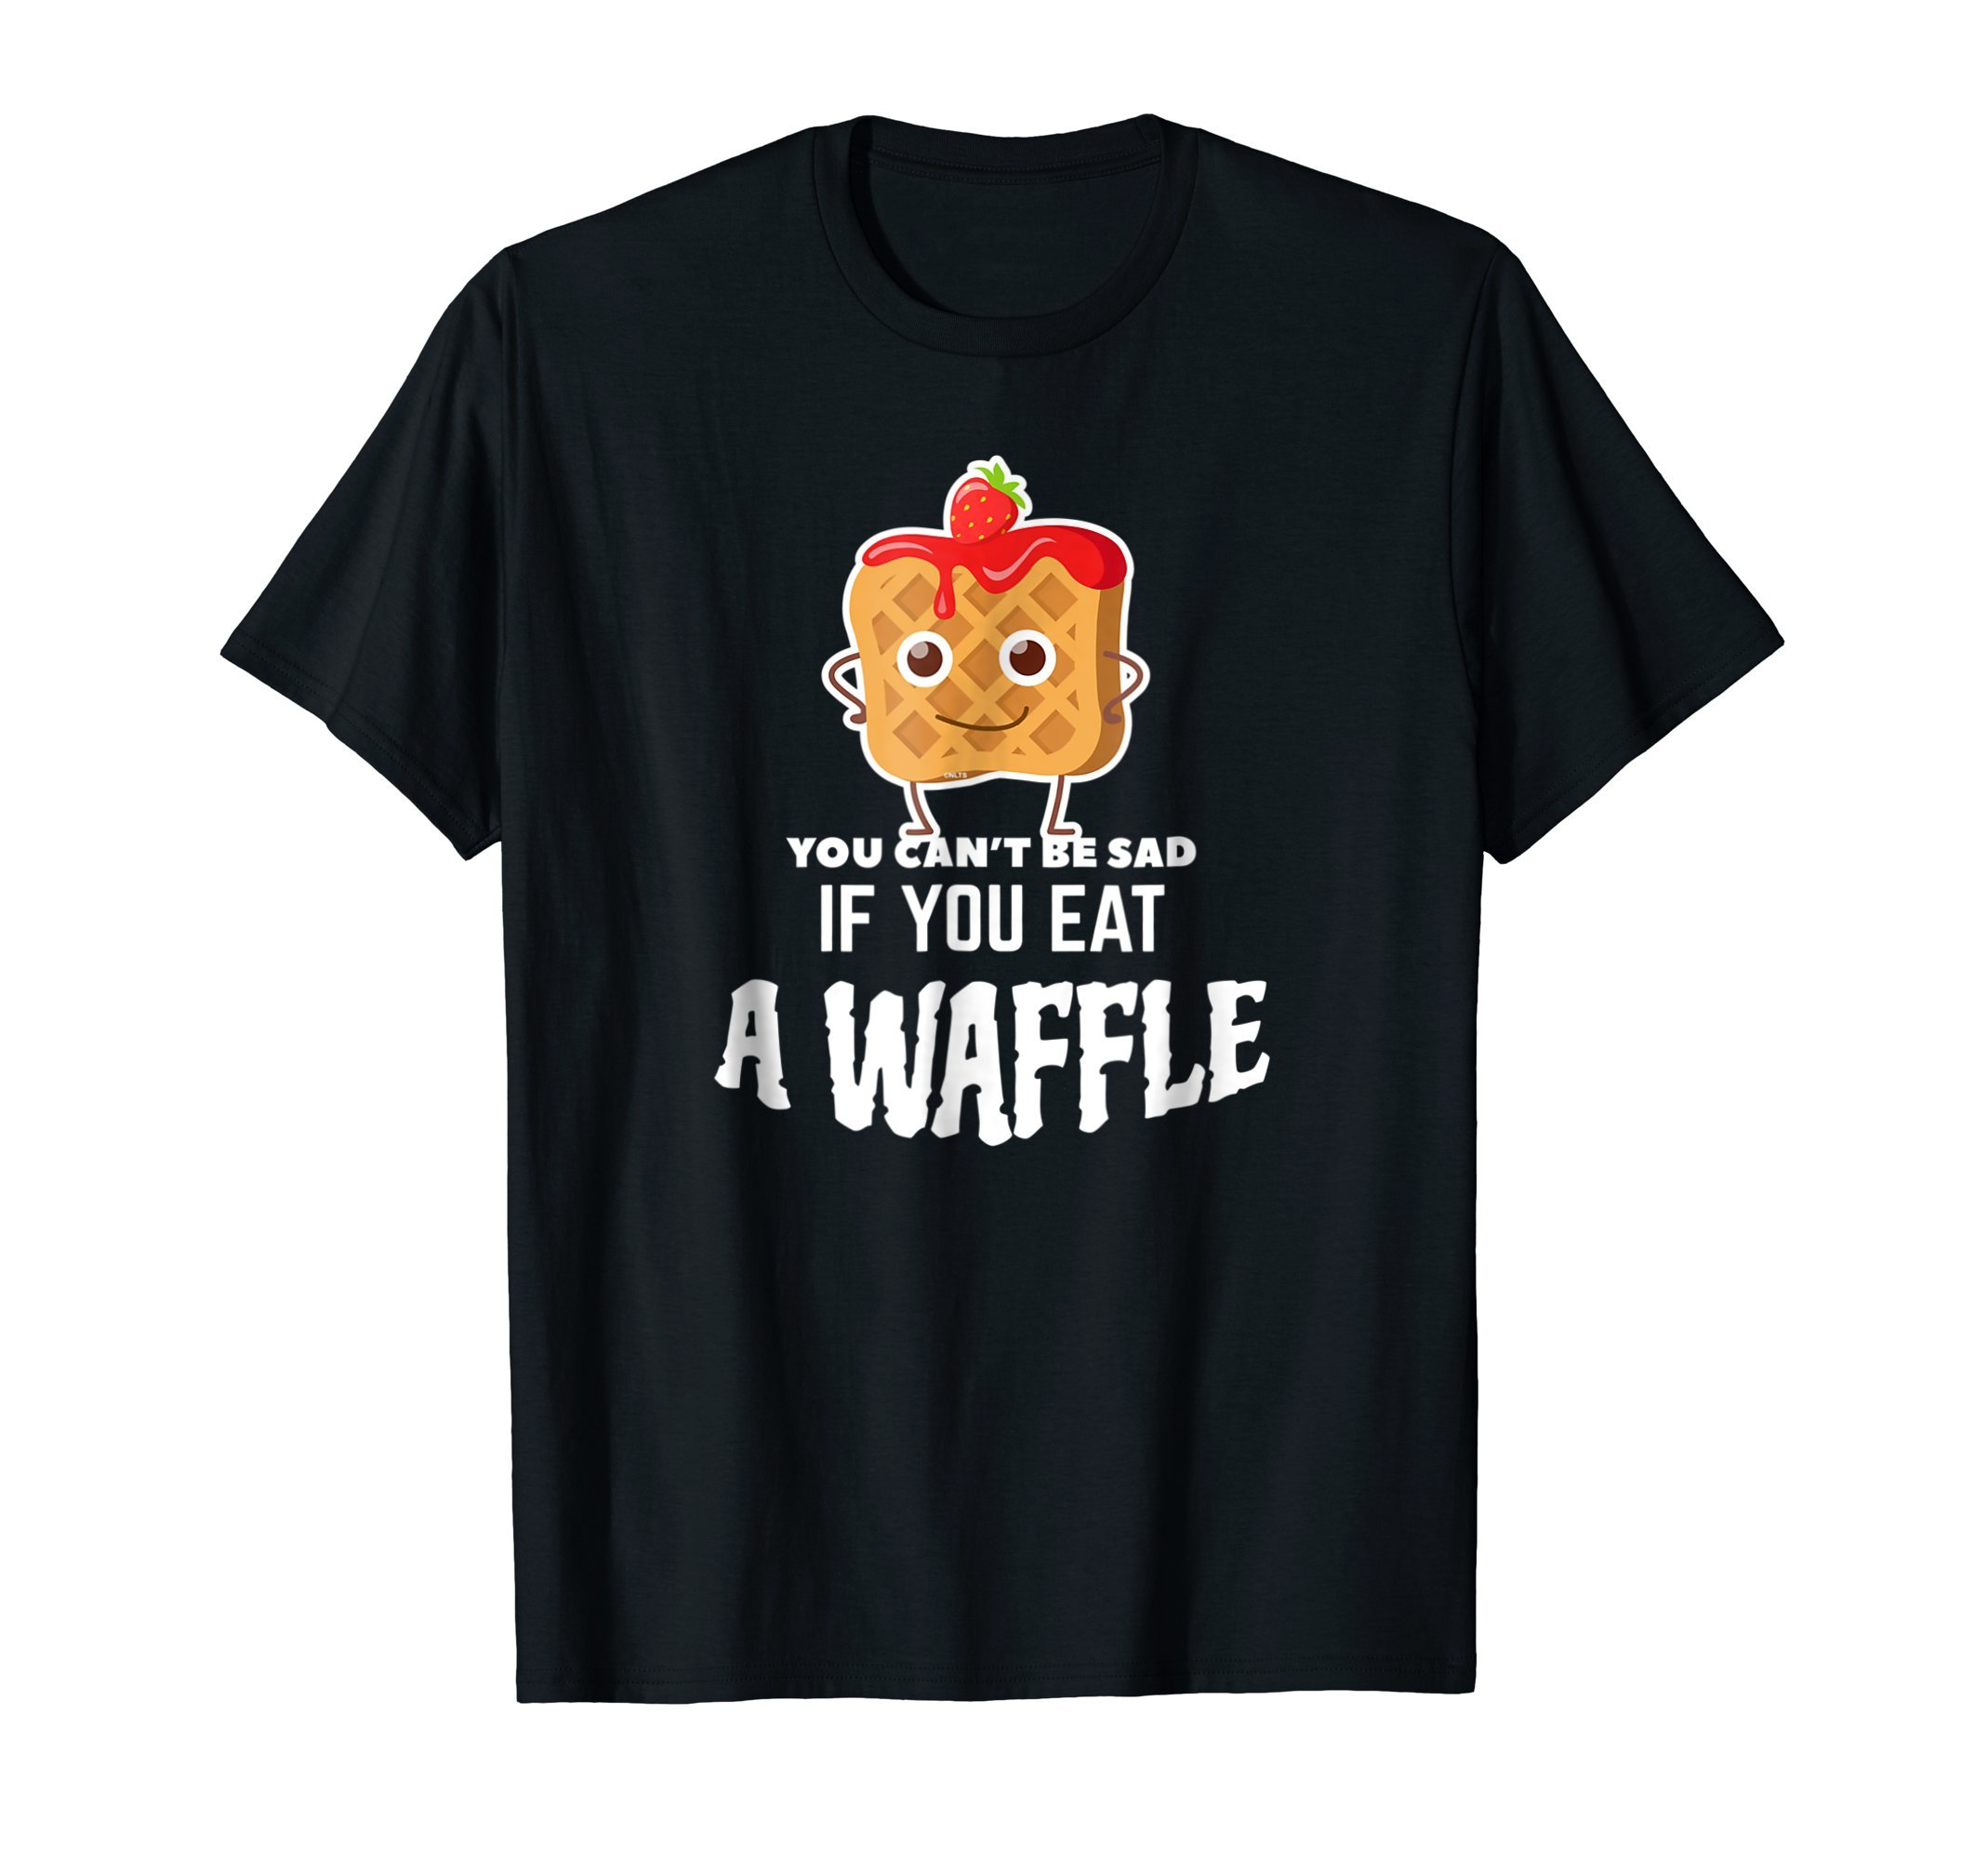 You-cant-be-sad-if-you-eat-a-waffle-T-Shirt-Novelty-Shirt